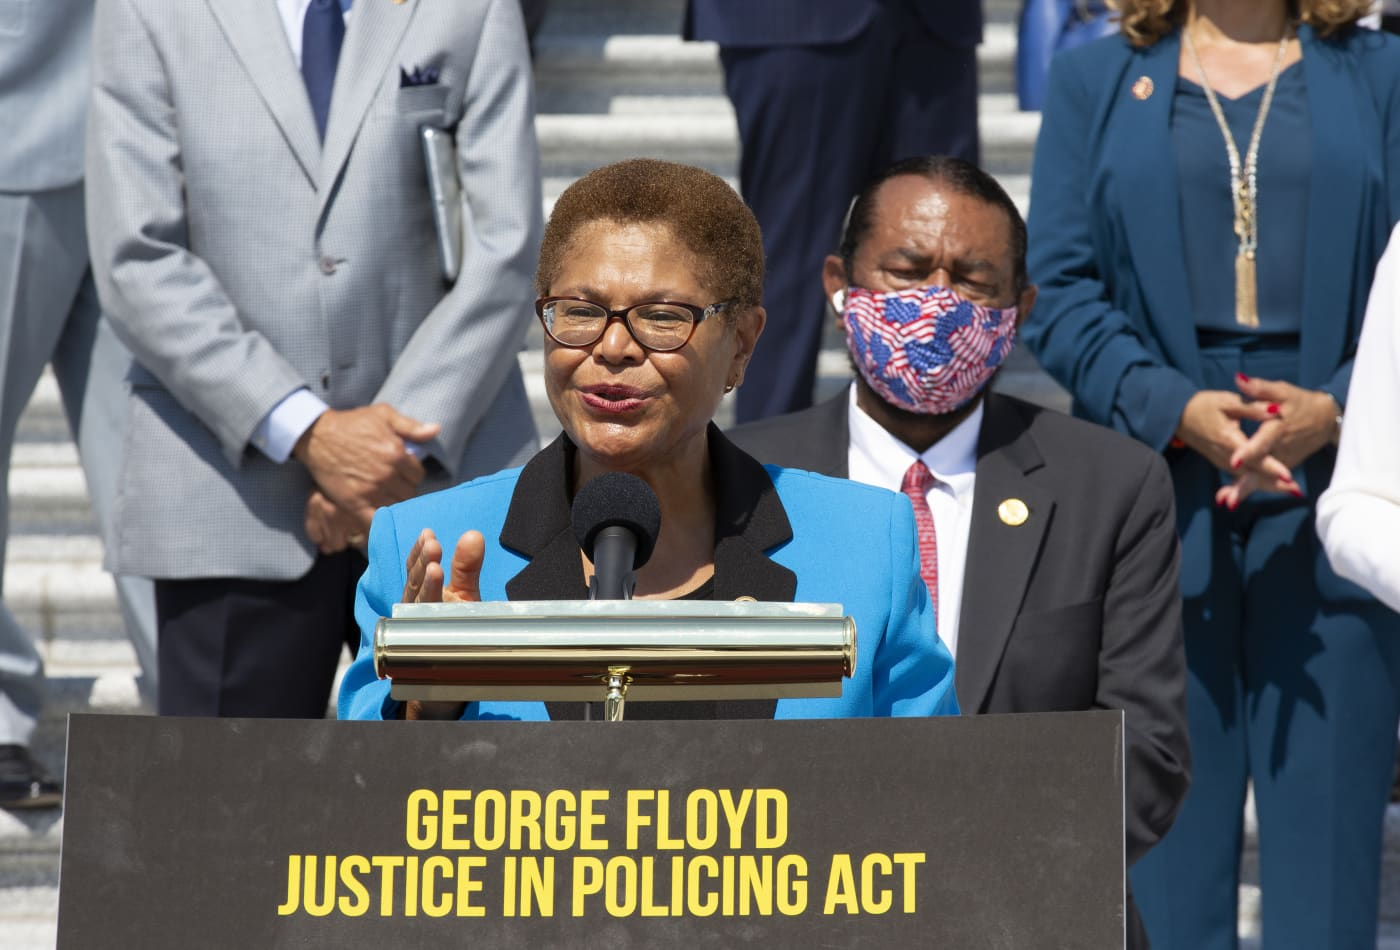 Congress is set to miss Biden's deadline to pass police reform bill as talks move forward